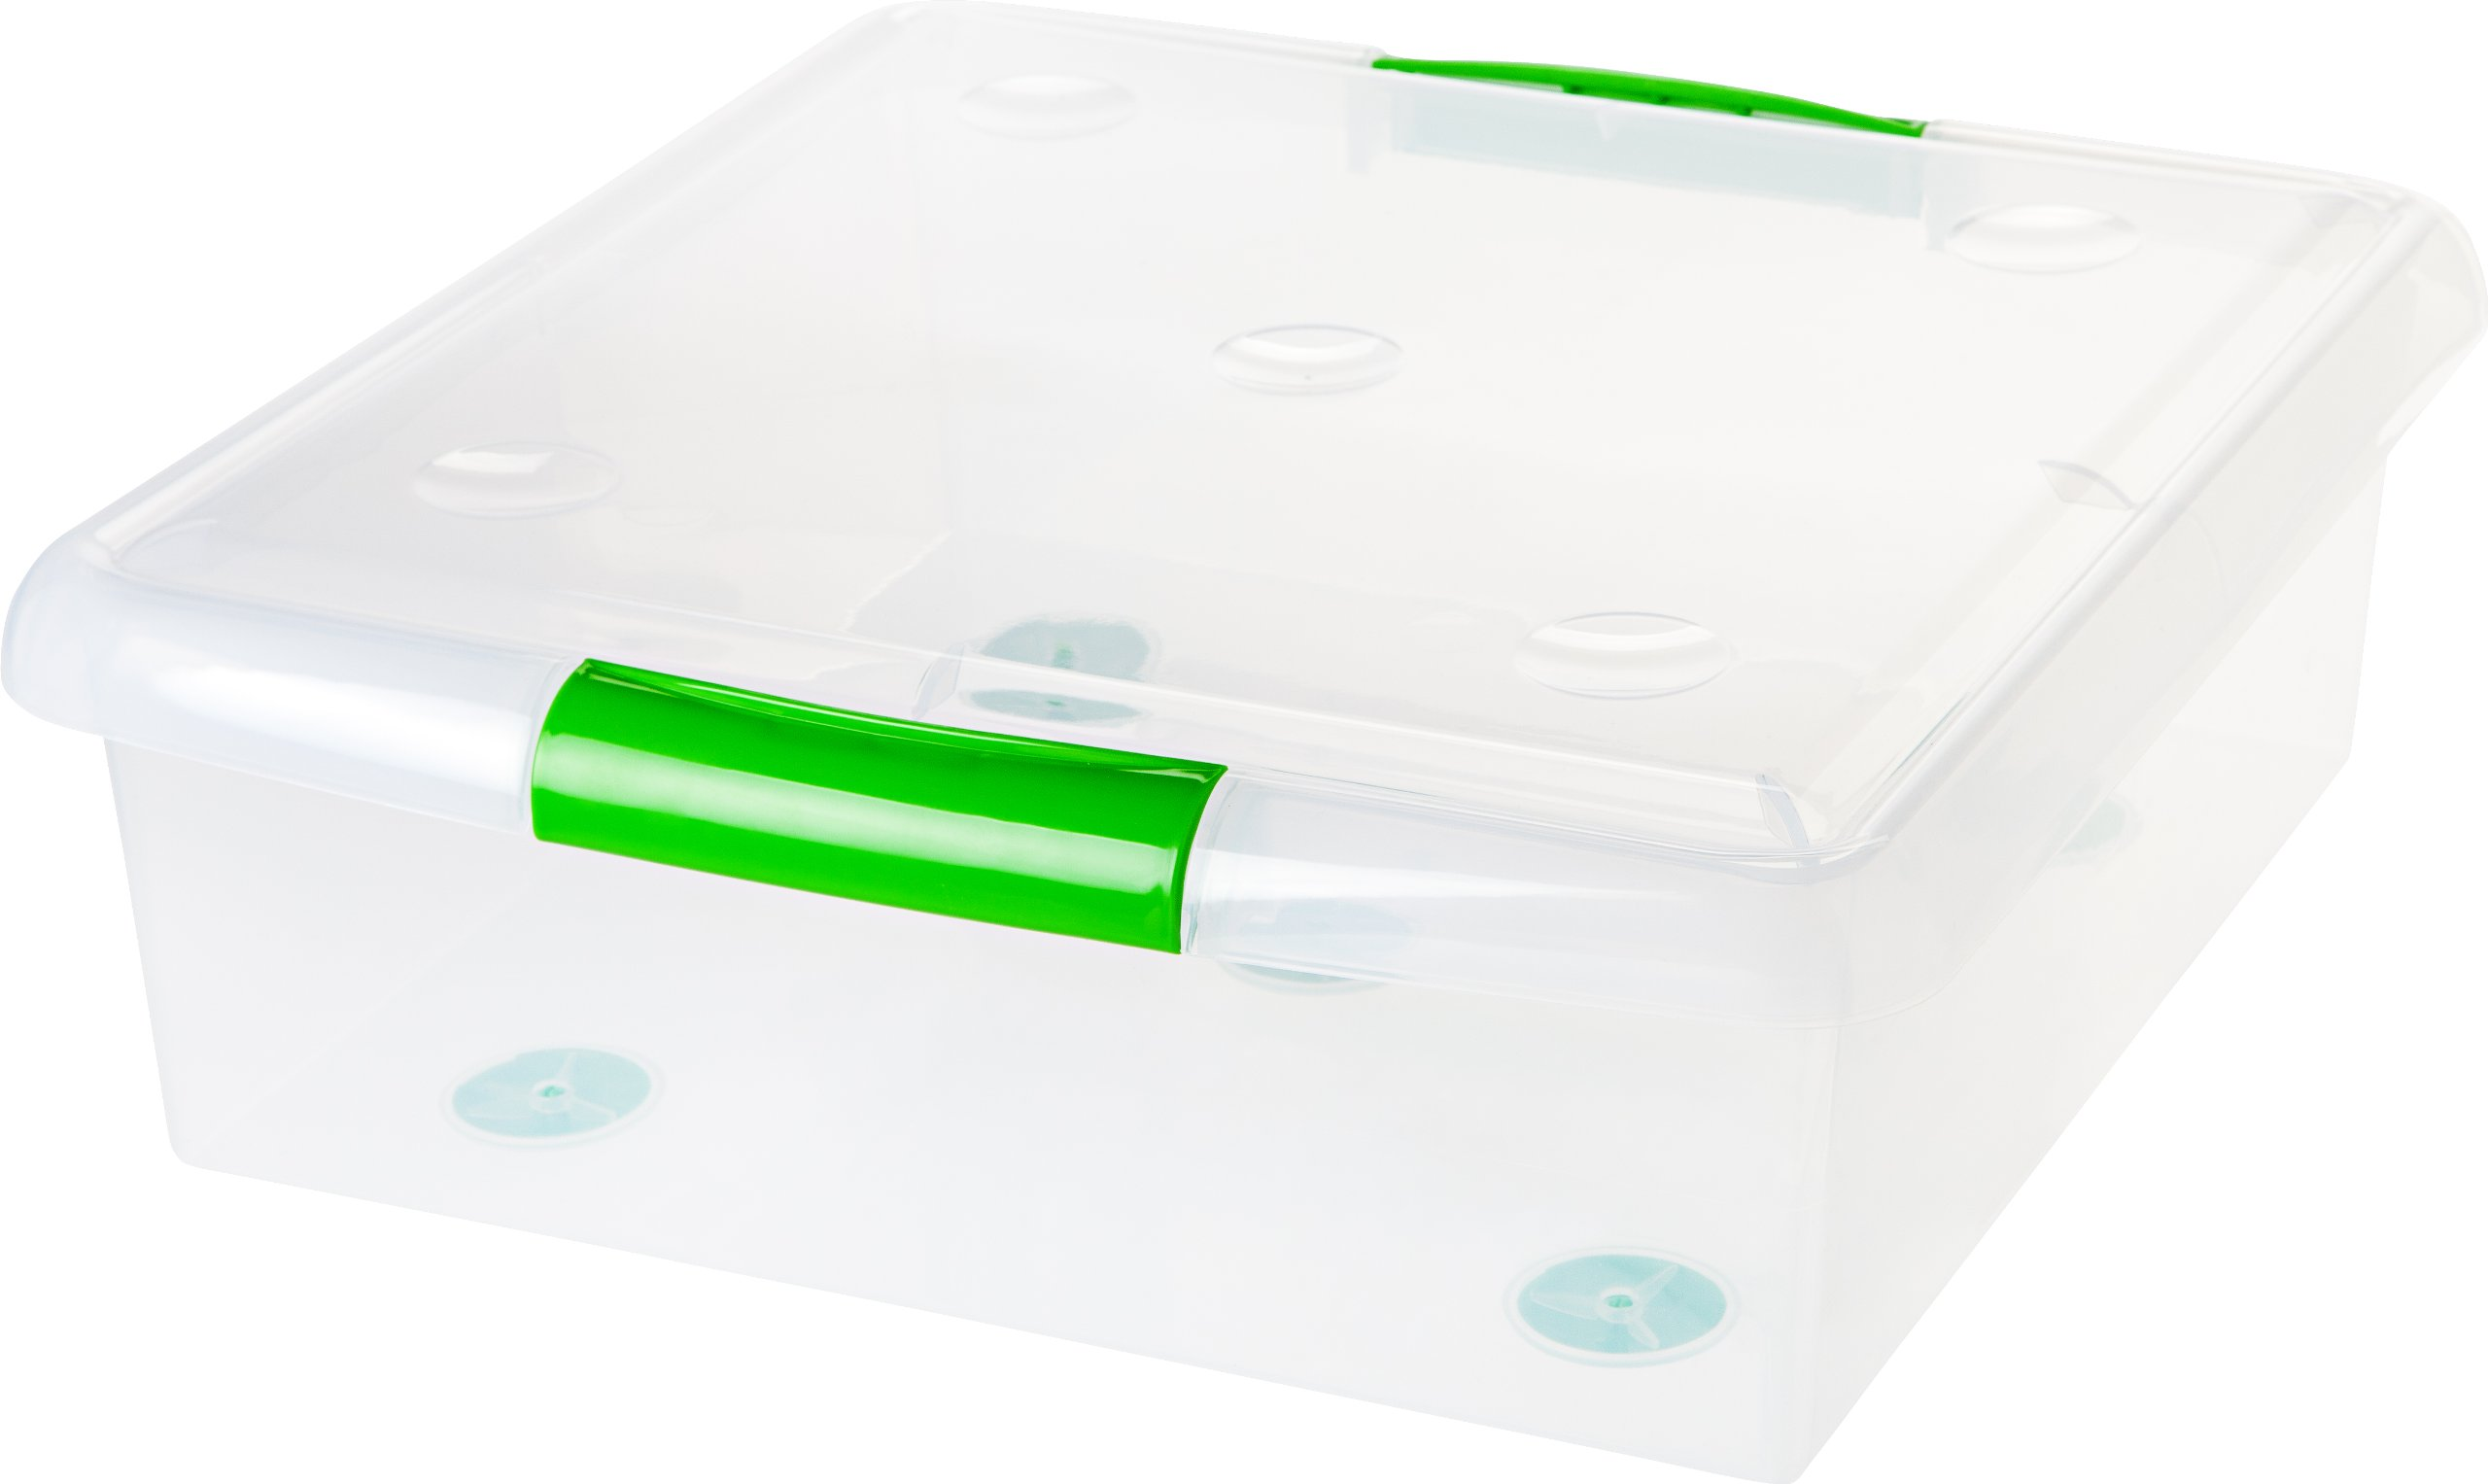 IRIS USA, Inc. SS-SQ CLR/Pebble Beach 6PC Set 1PK [ECOM] IRIS 25 Quart Store & Slide Storage Box, Green by IRIS USA, Inc.